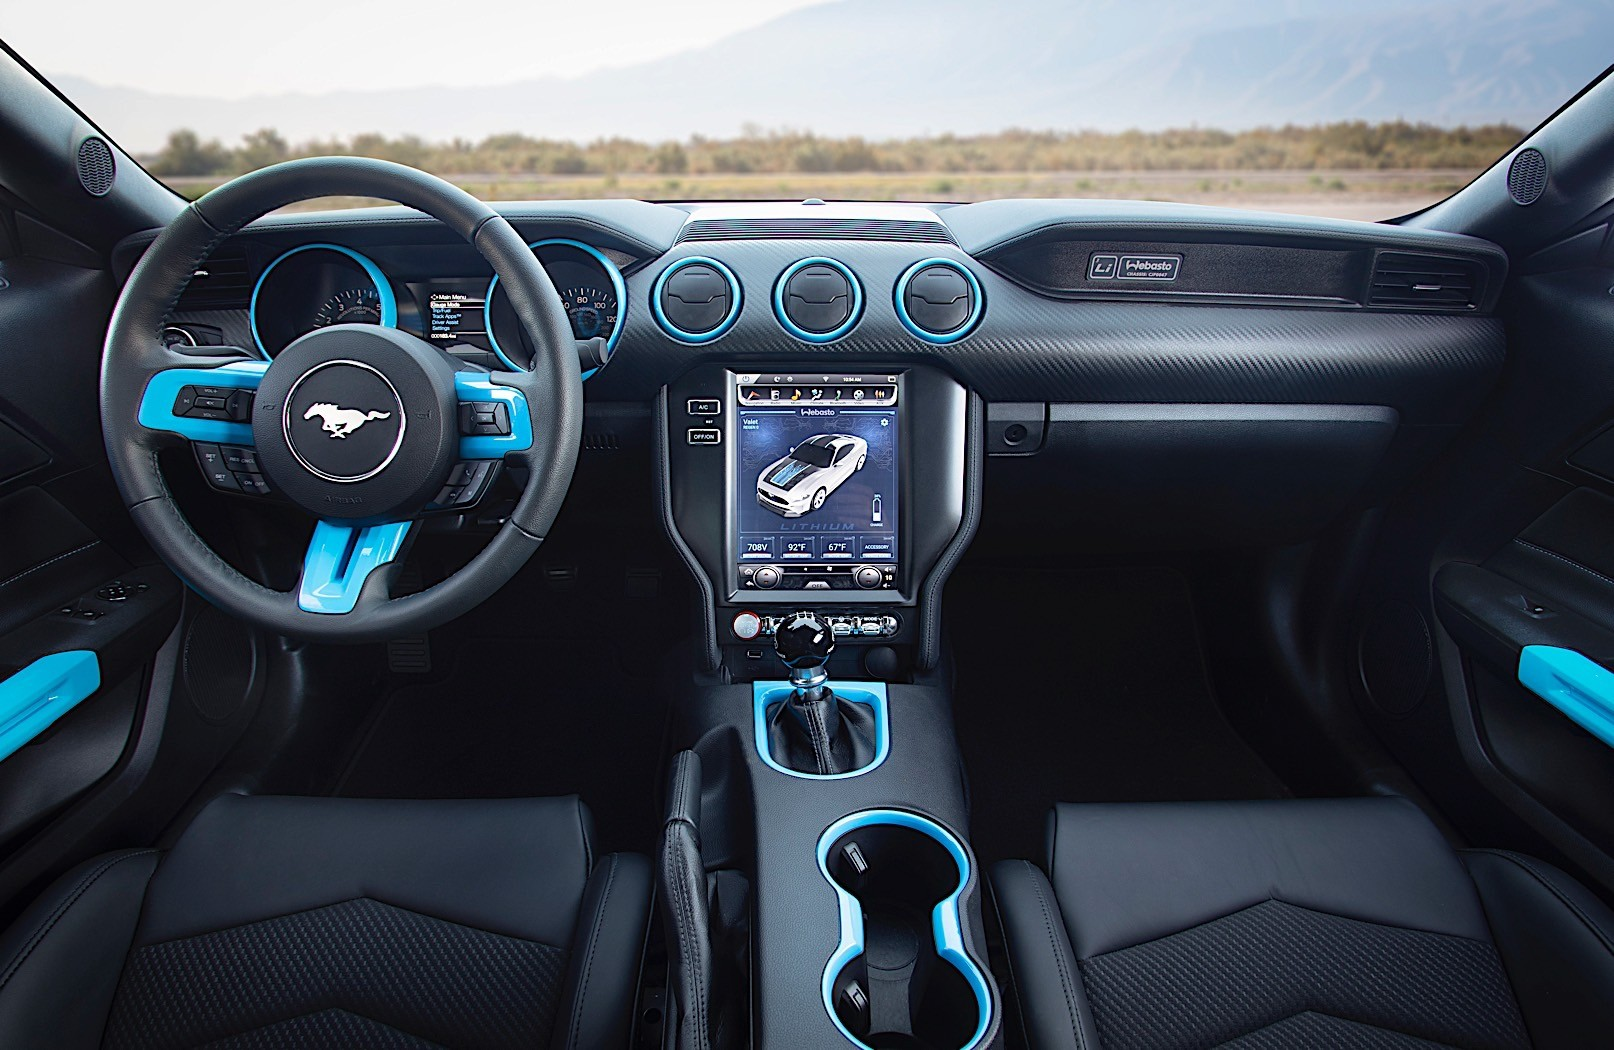 2023 Ford Mustang S650 Program Confirmed  Gen 7 Launching